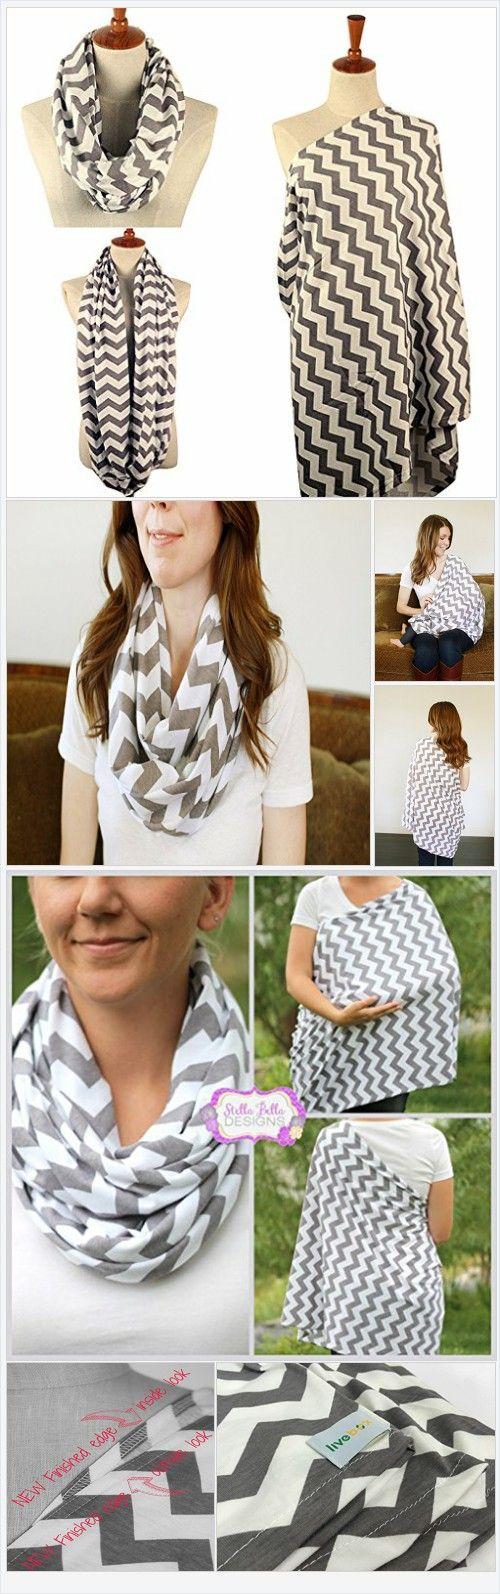 LiveBox Extra Long Breast Feeding InfinityNursing Scarf (Grey and White Chevron) - Every Thing Baby